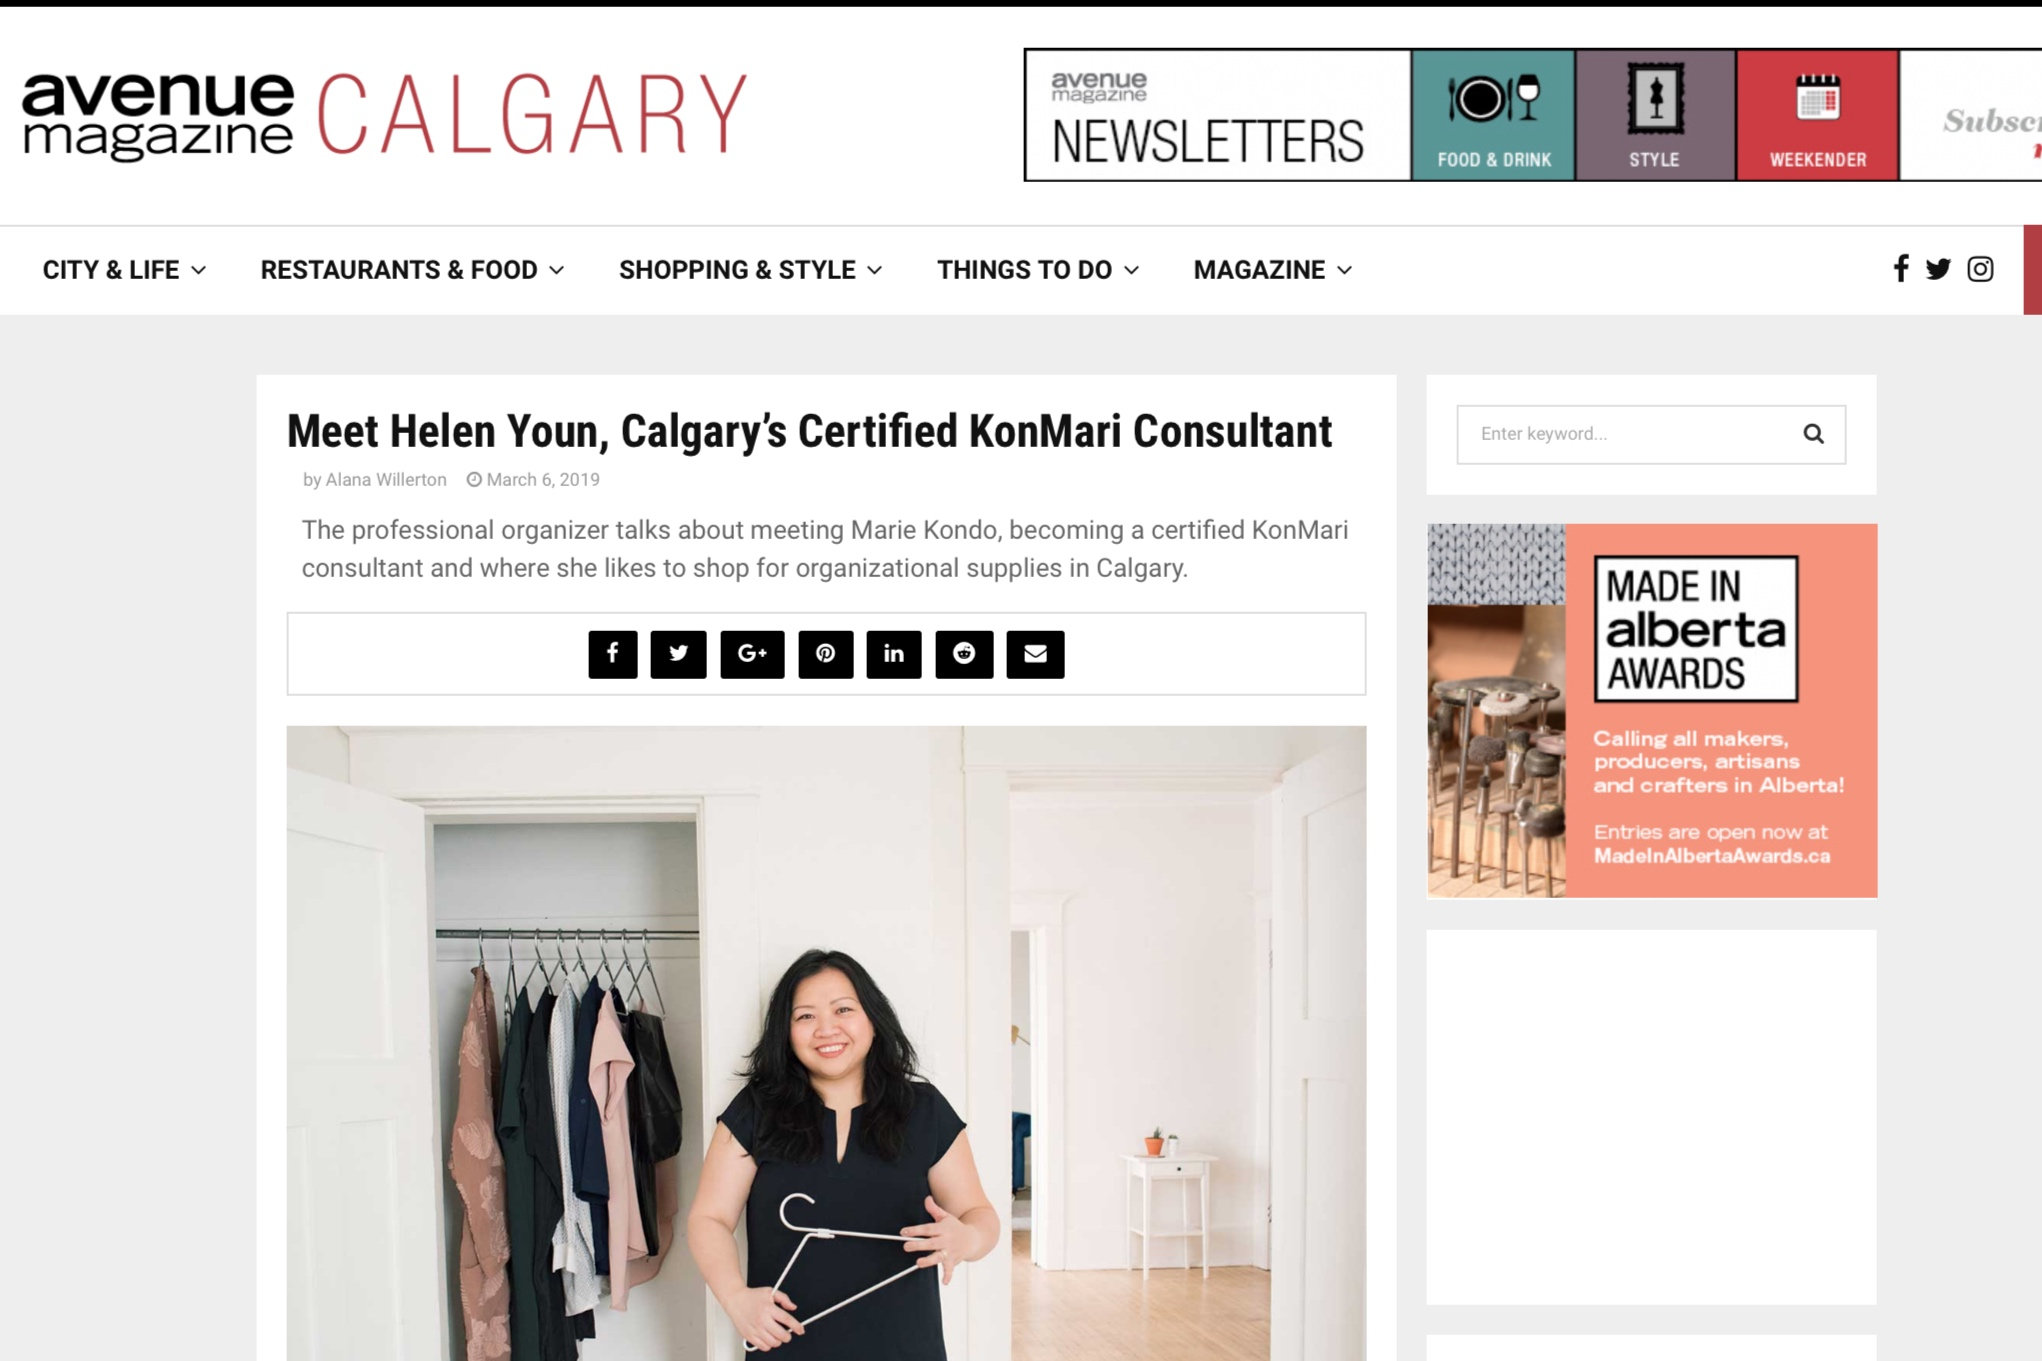 Avenue Calgary: Meet Helen Youn, Calgary's Certified KonMari Consultant